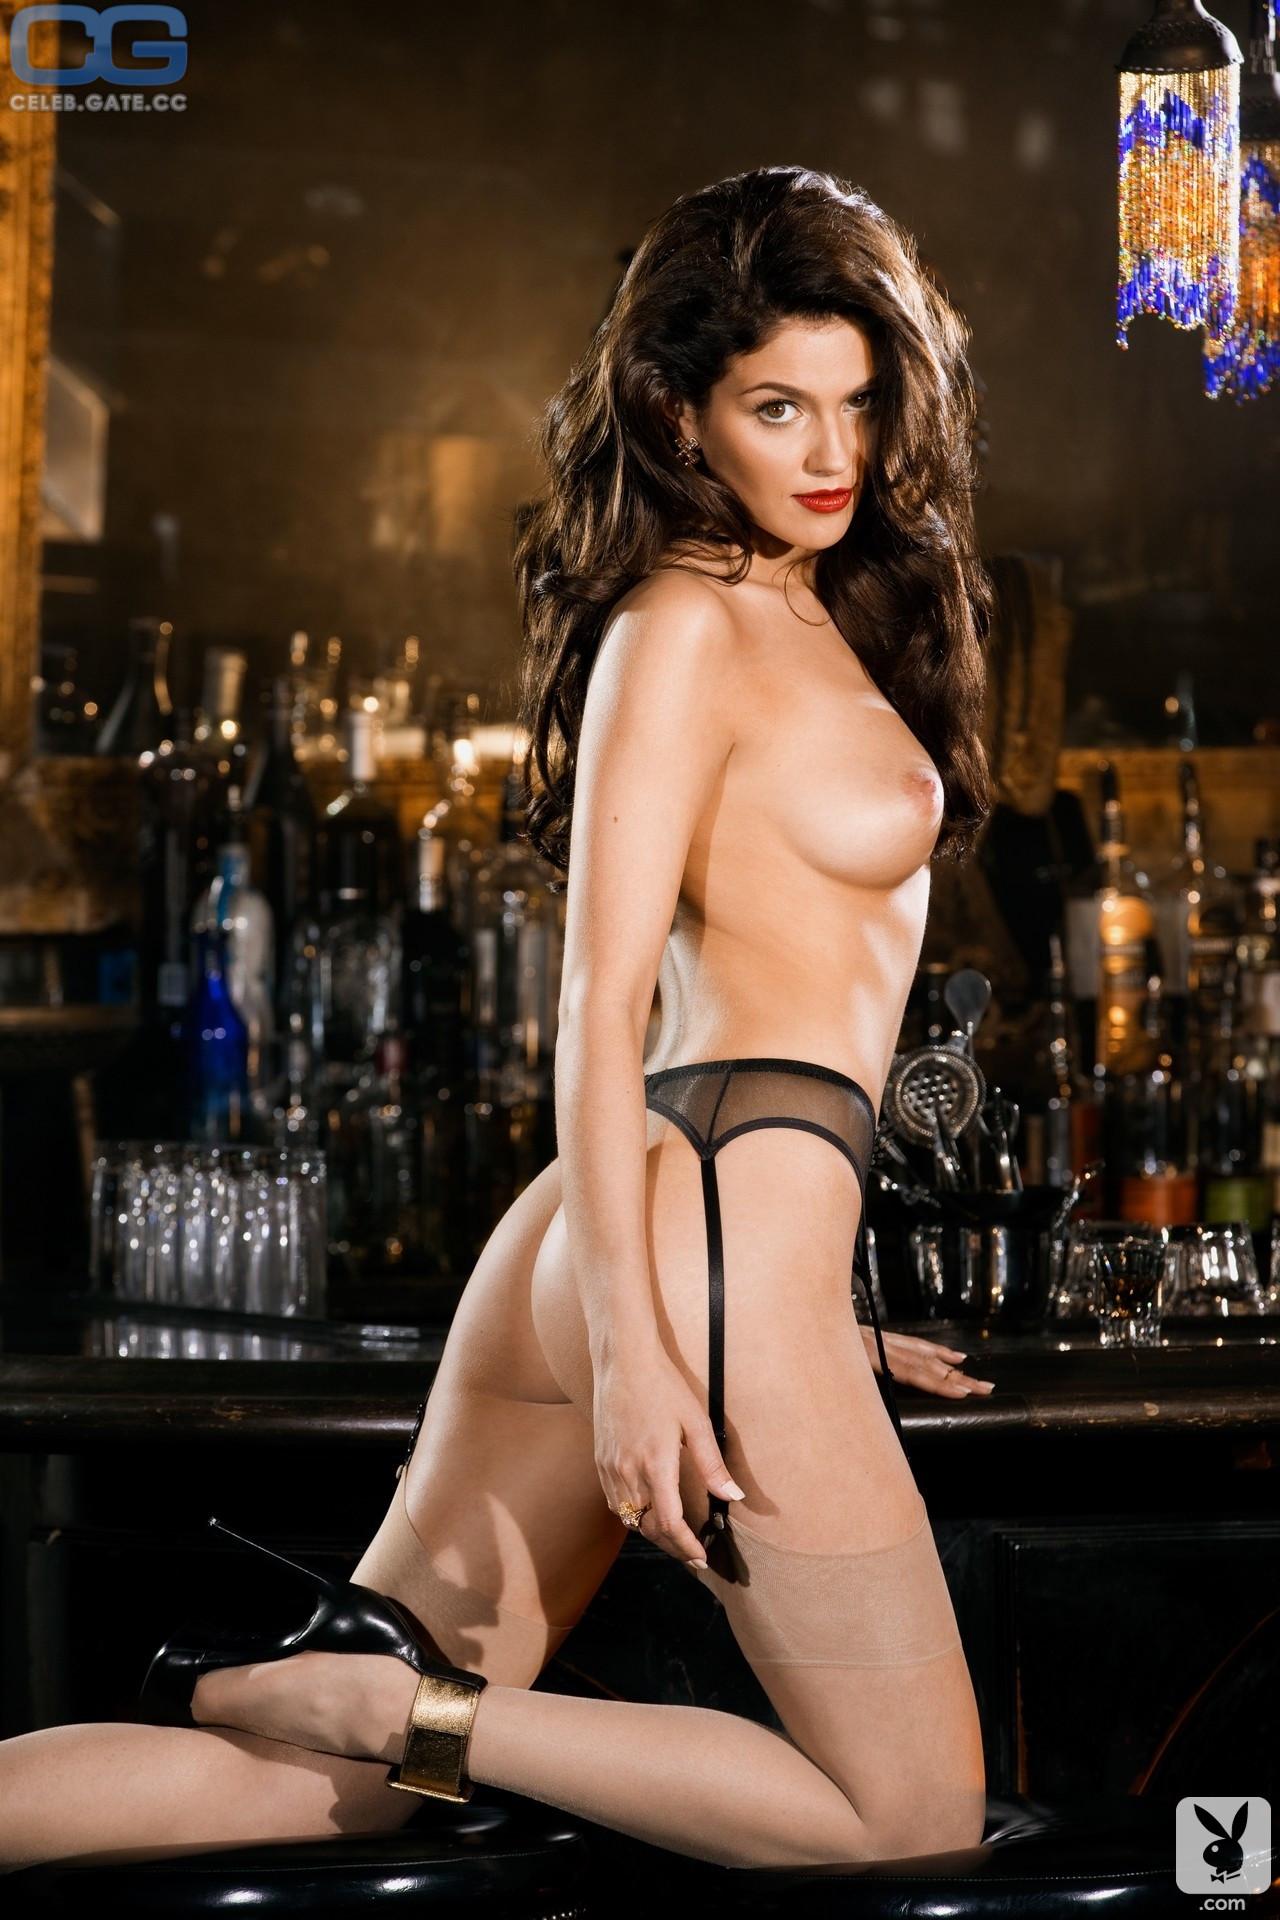 Superstar Victoria Val Nude Pictures Pics